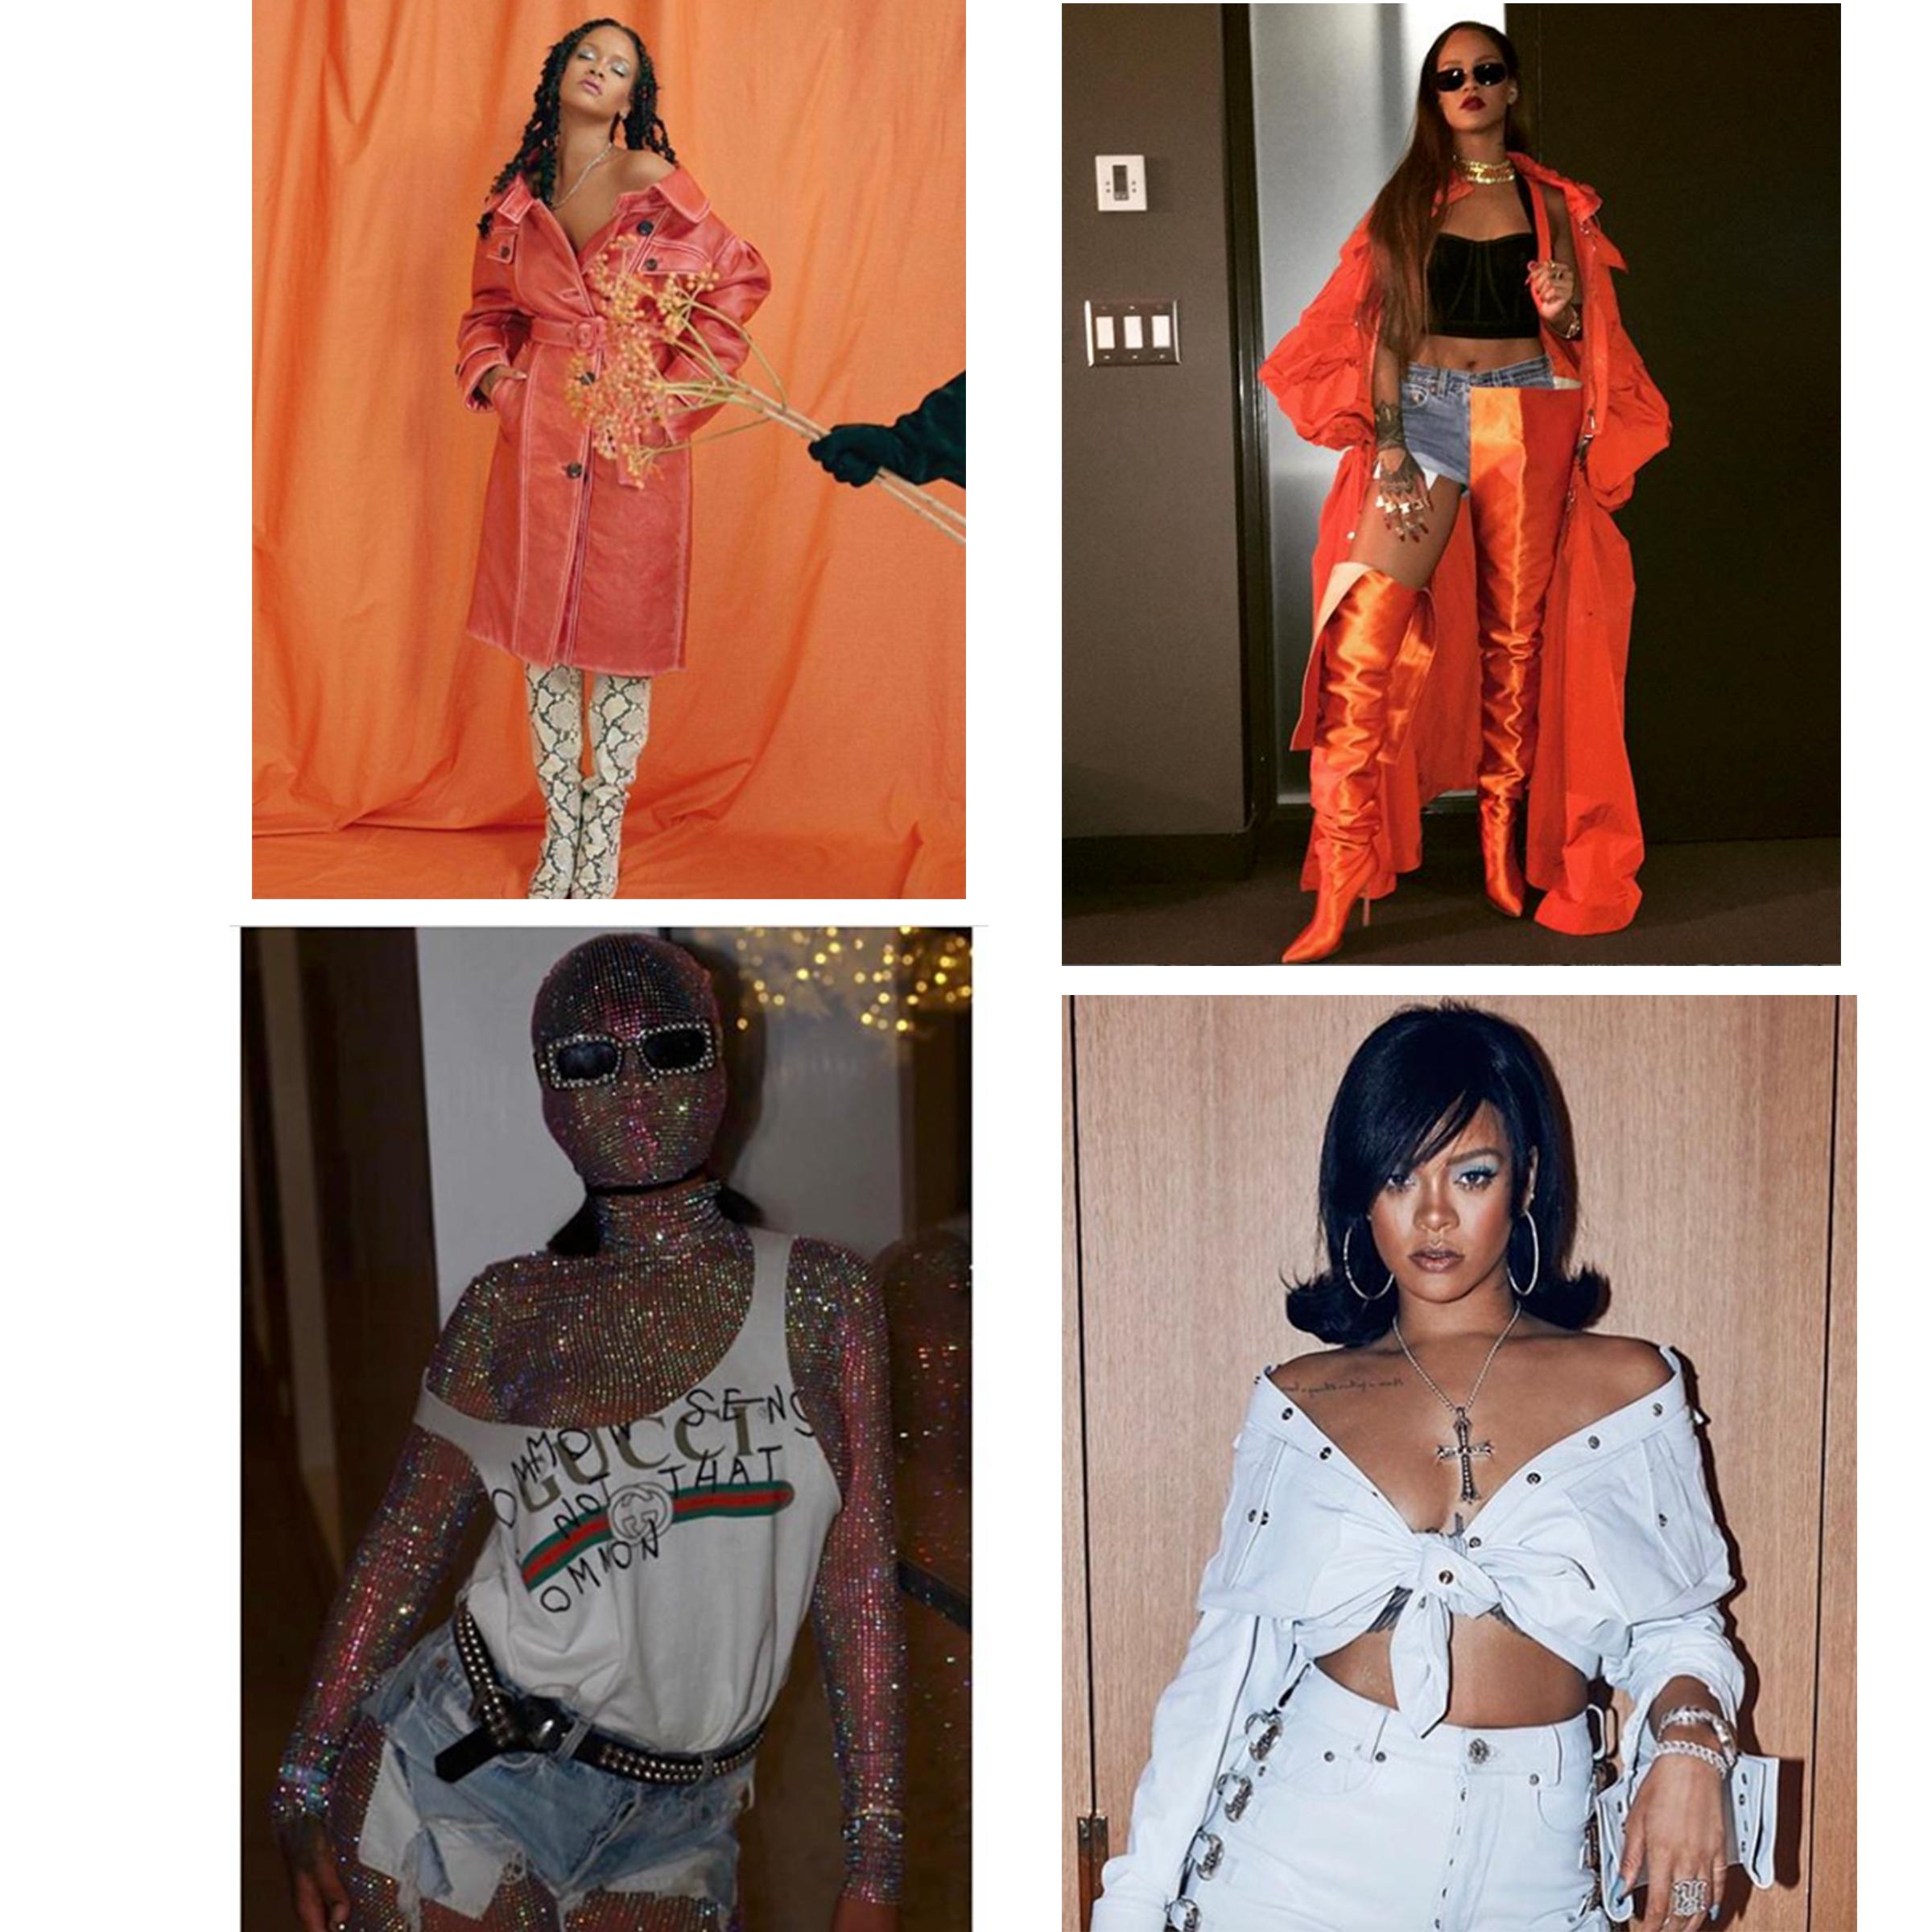 Rihanna Styled by Jahleel Weaver